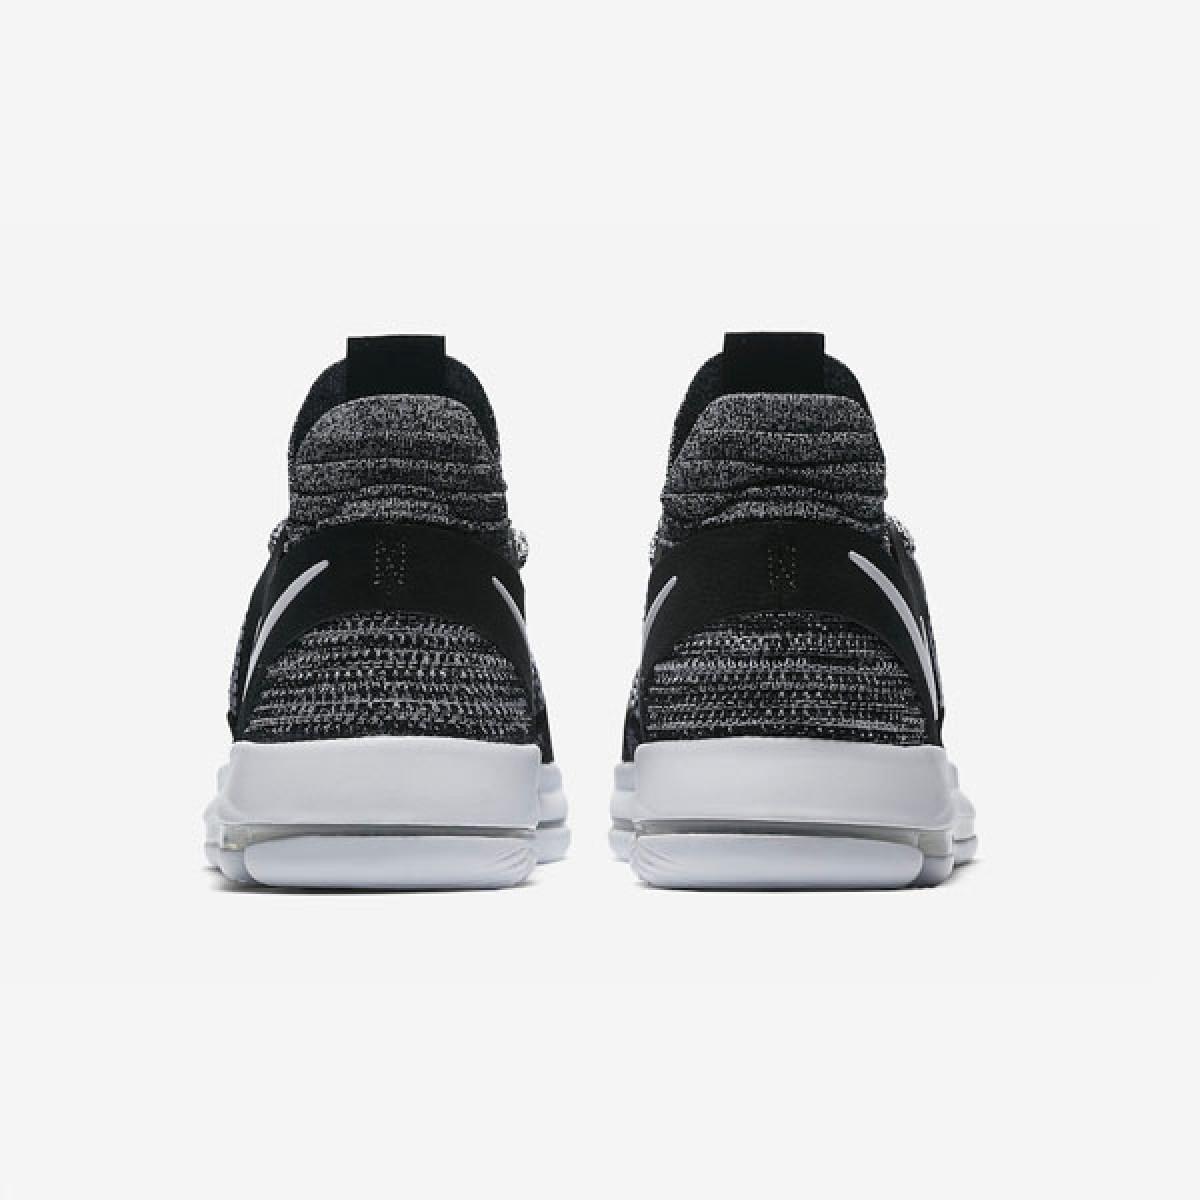 Nike Zoom KD 10 'Oreo' 897815-001